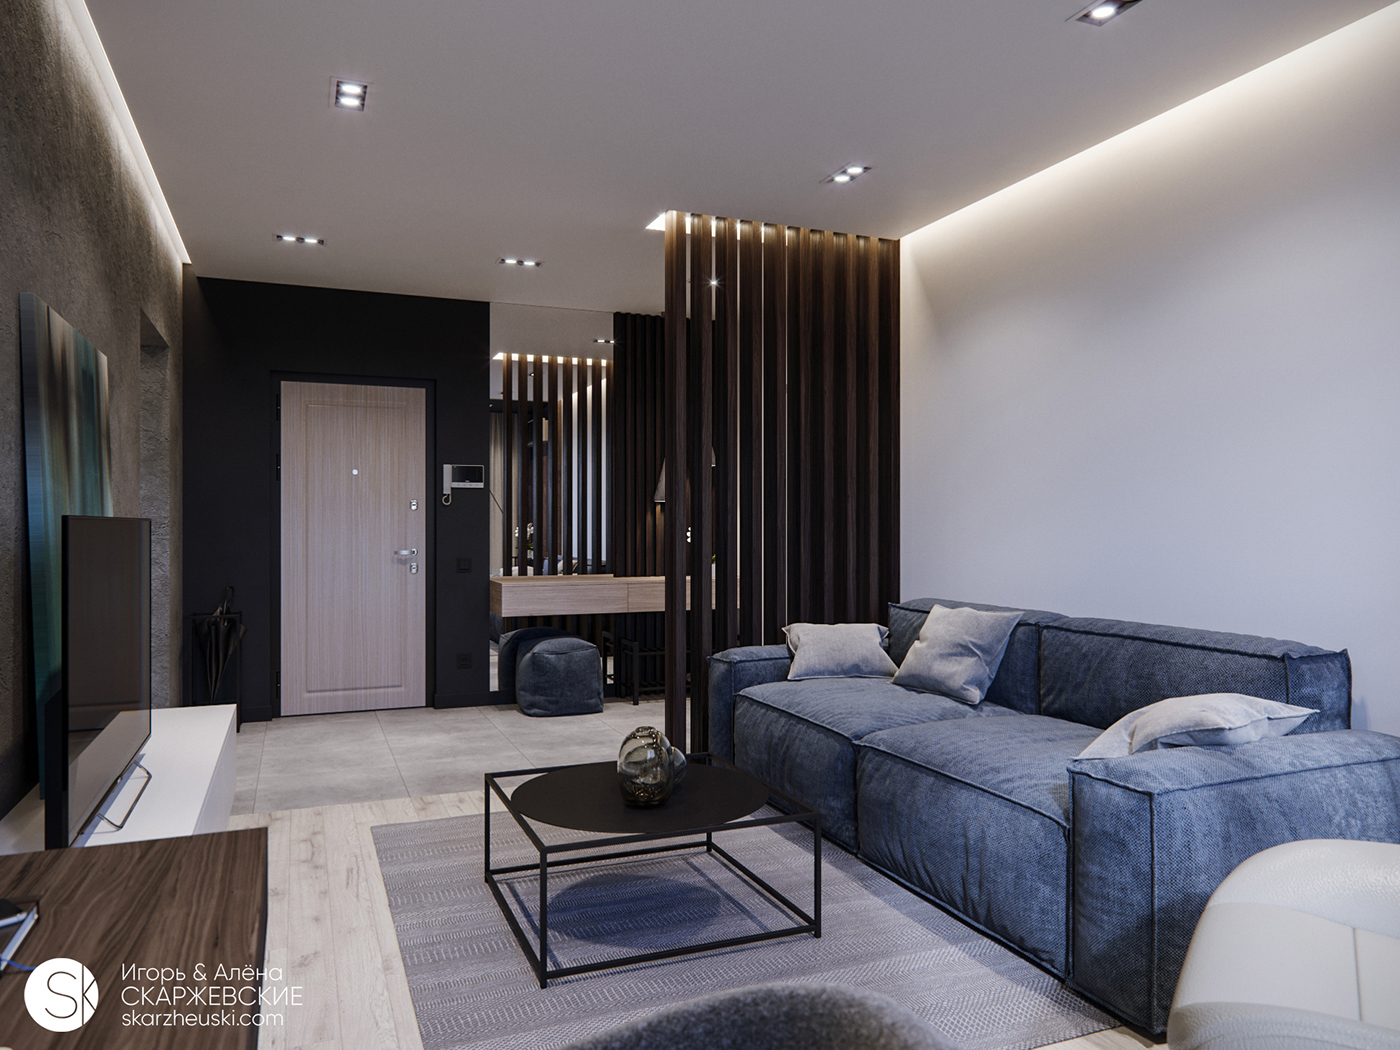 APARTMENT 61 极简主义室内设计 欣赏-第5张